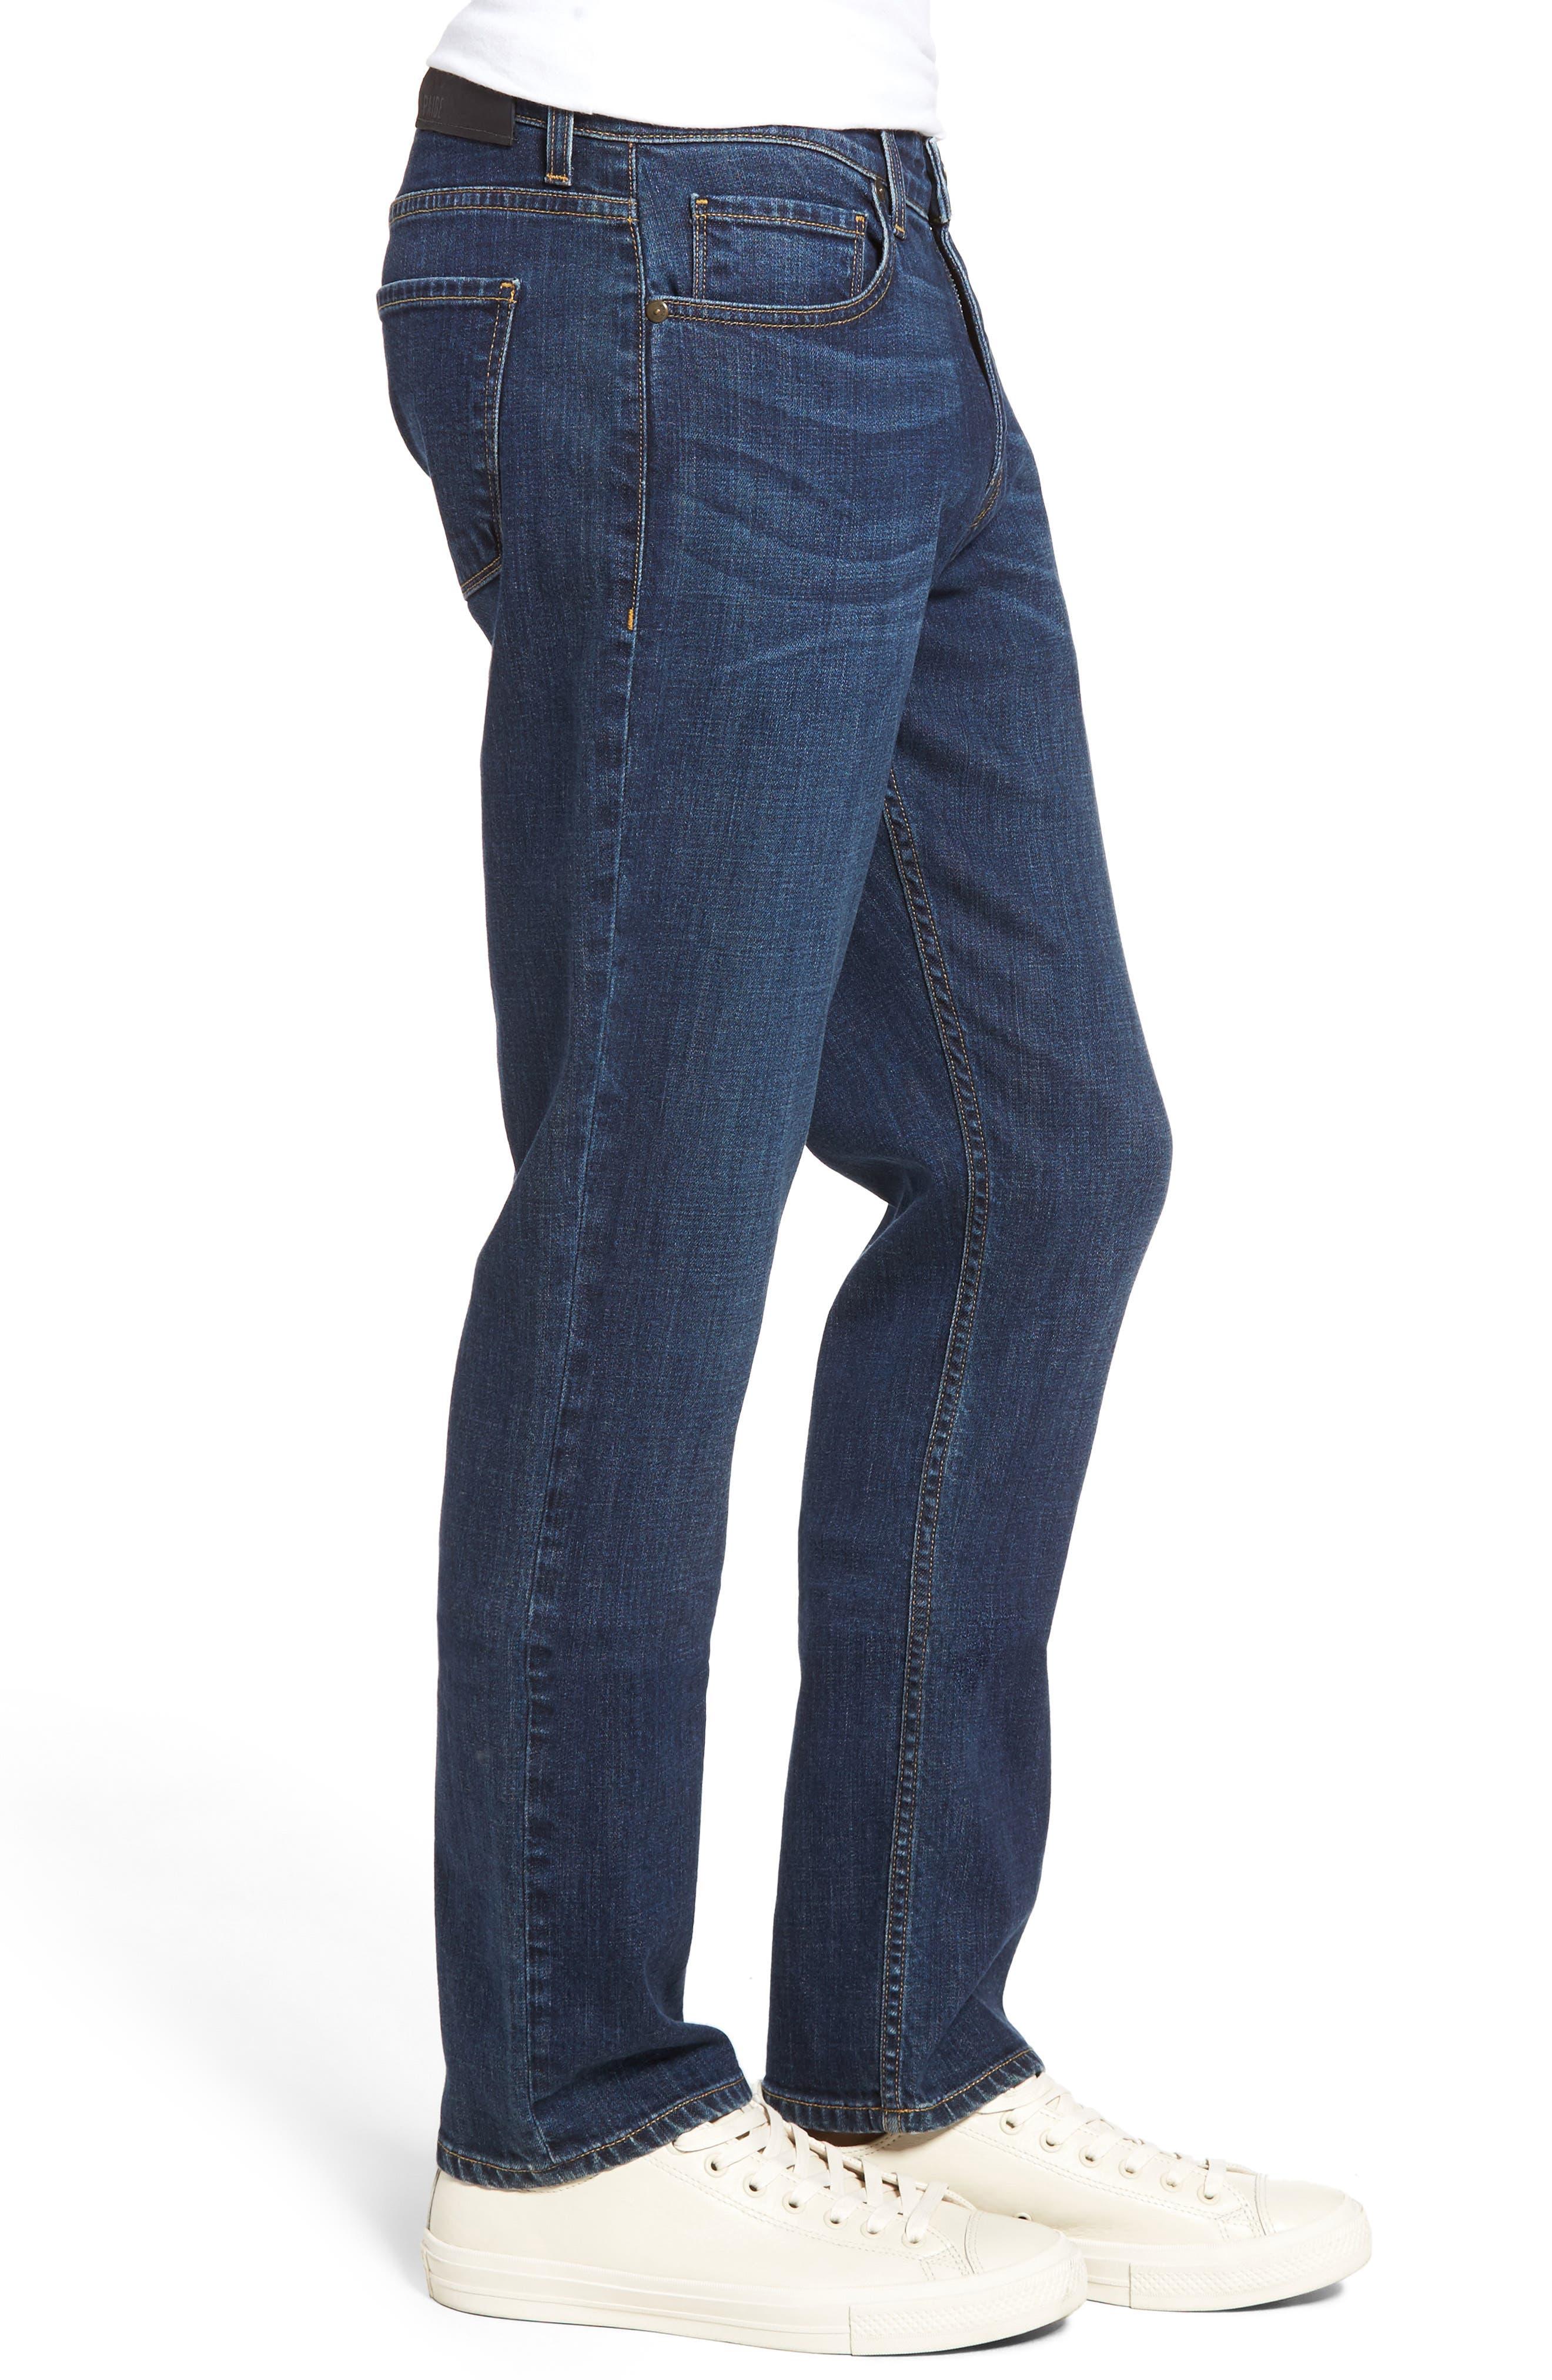 Normandie Straight Leg Jeans,                             Alternate thumbnail 3, color,                             ANGELO